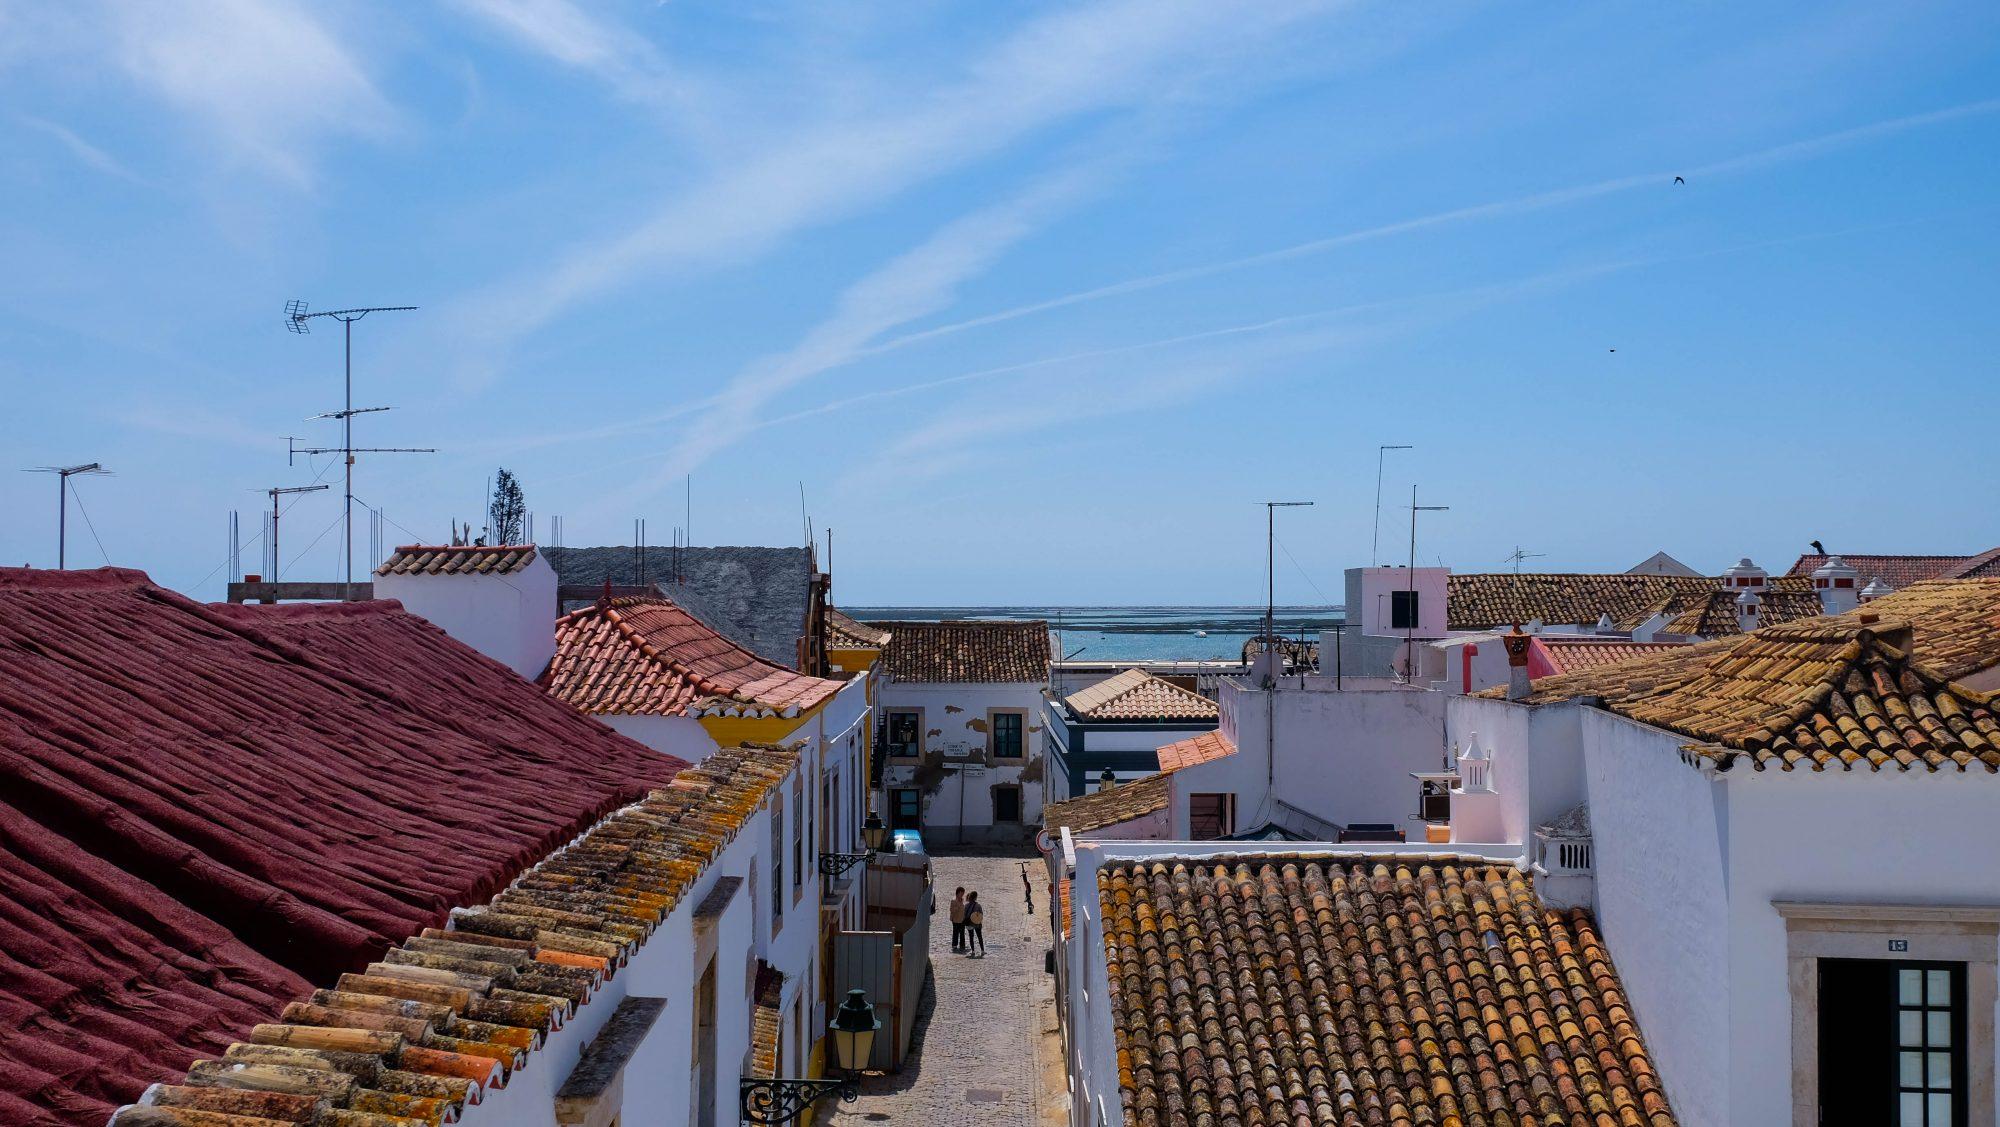 Vue du Rooftop - Faro, Portugal